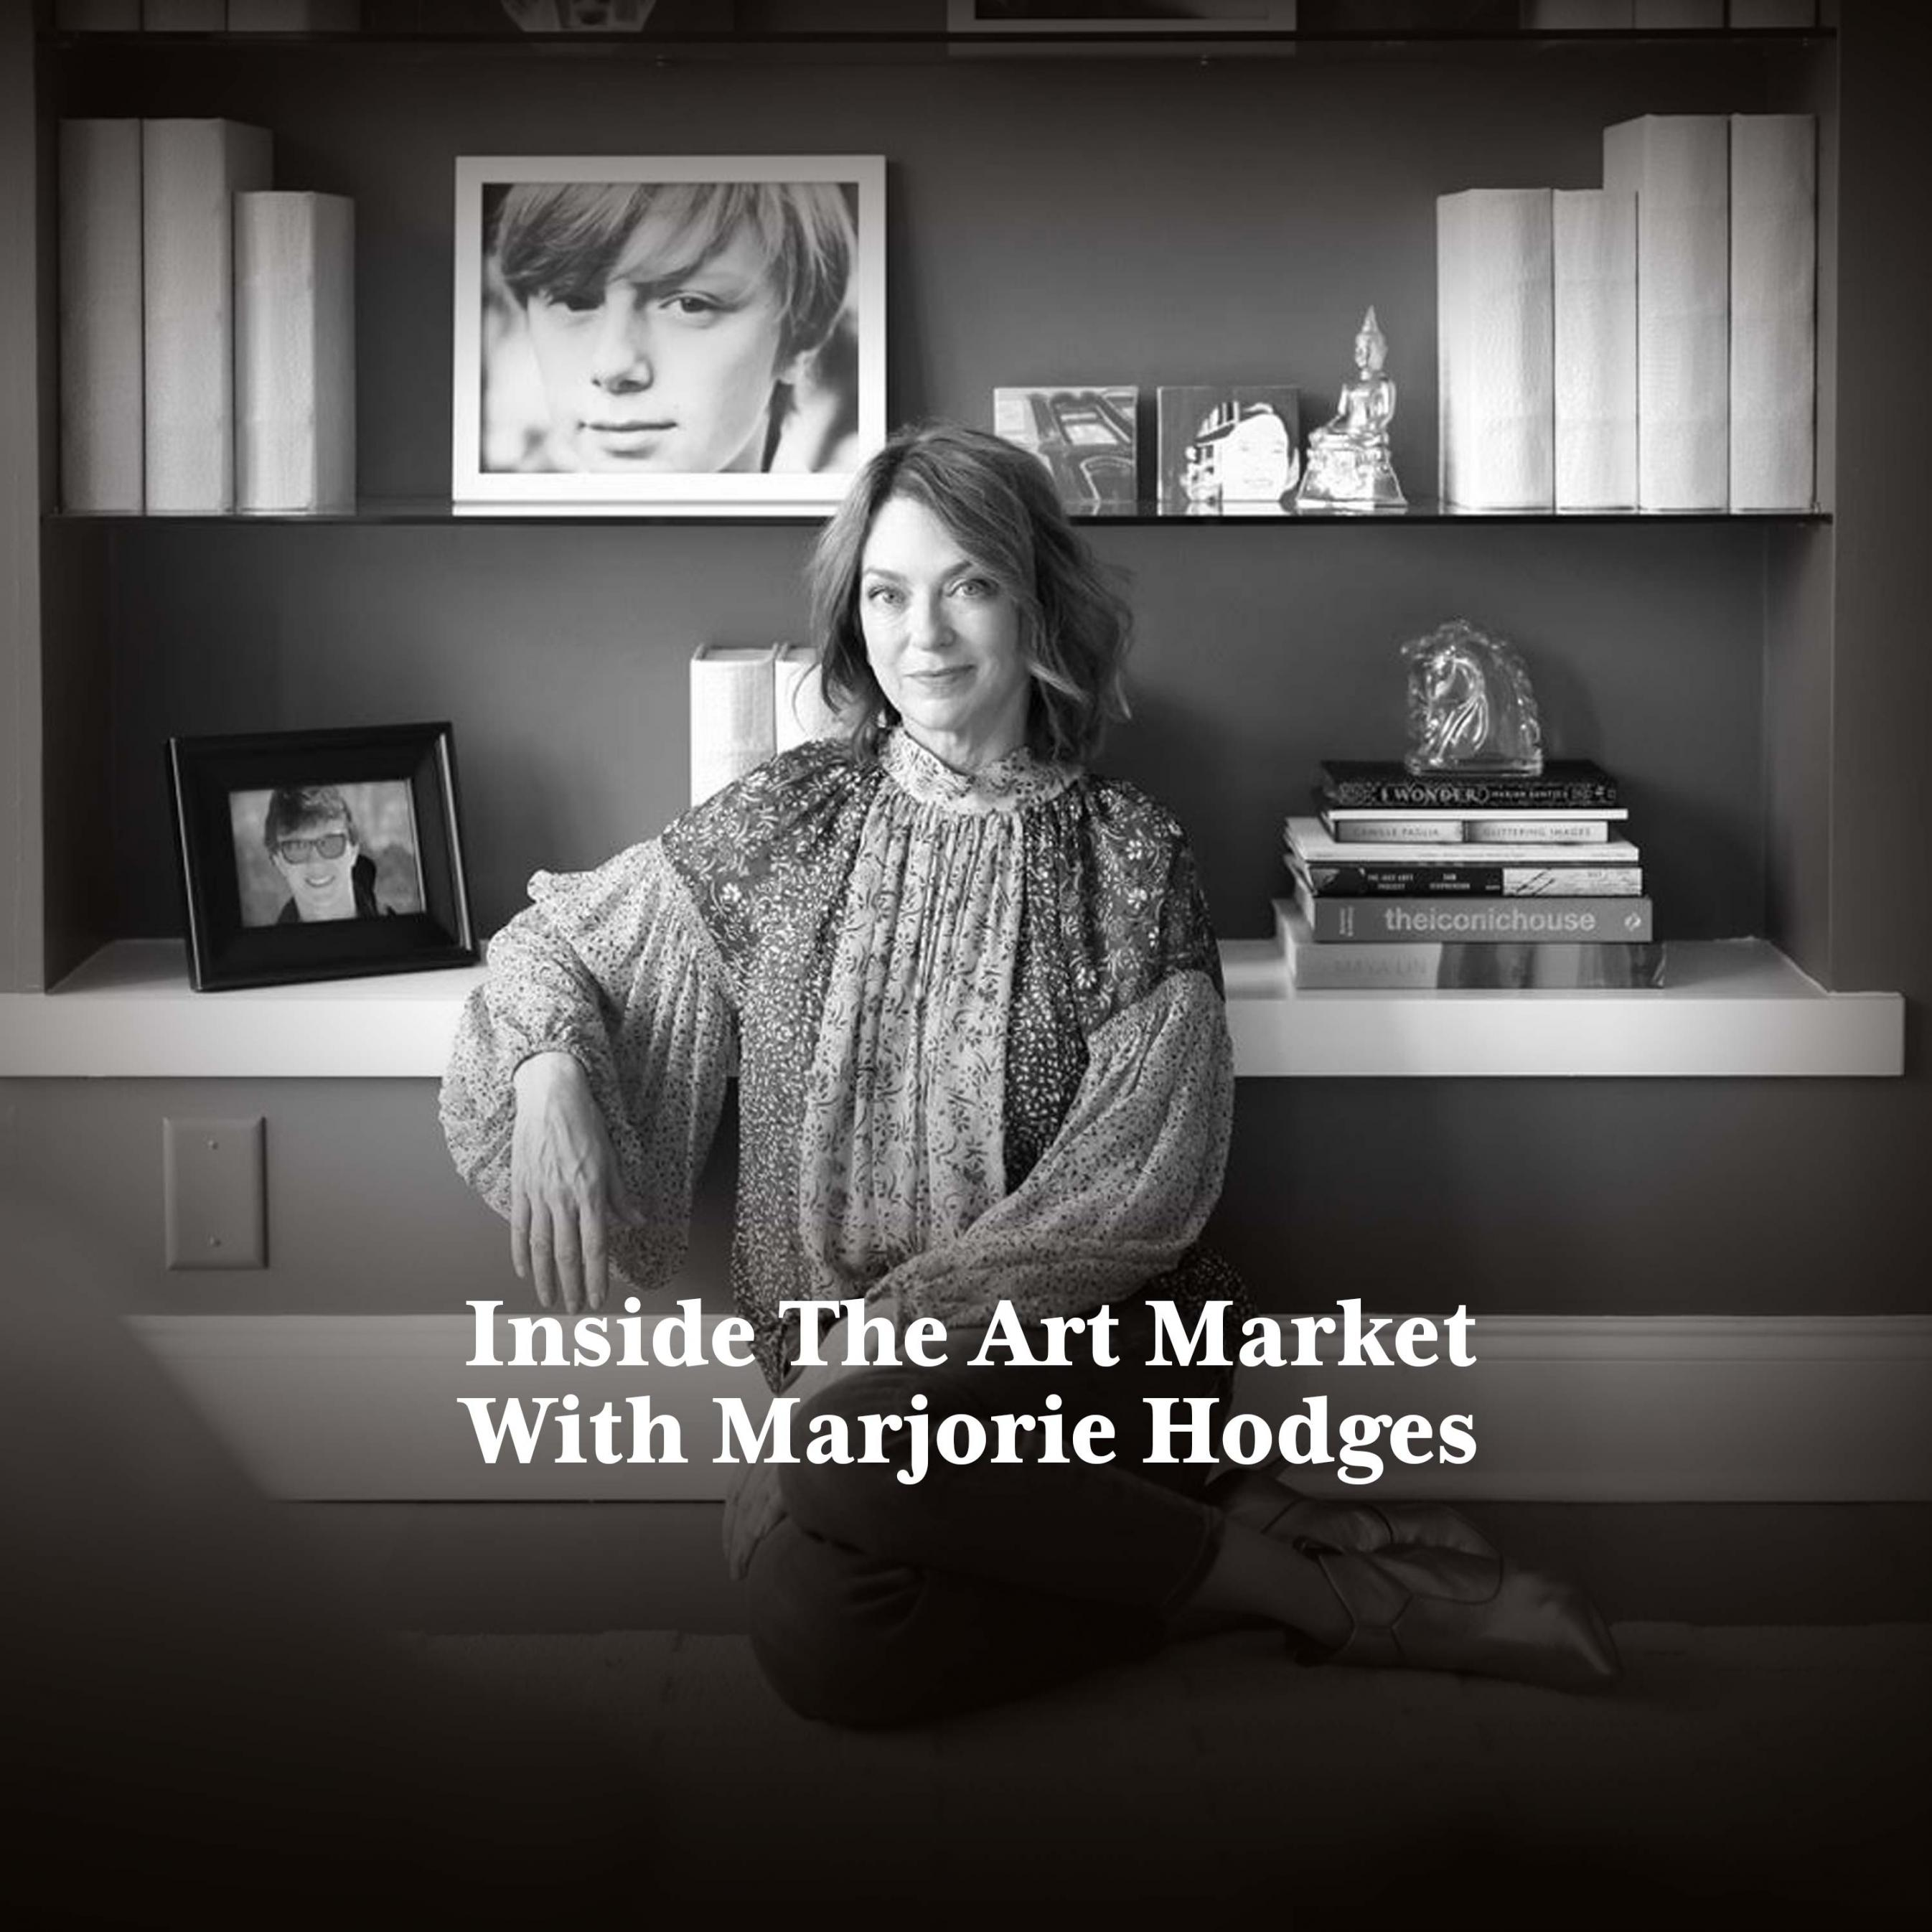 art-consultant-marjorie-hodges-on-the-contemporary-art-market